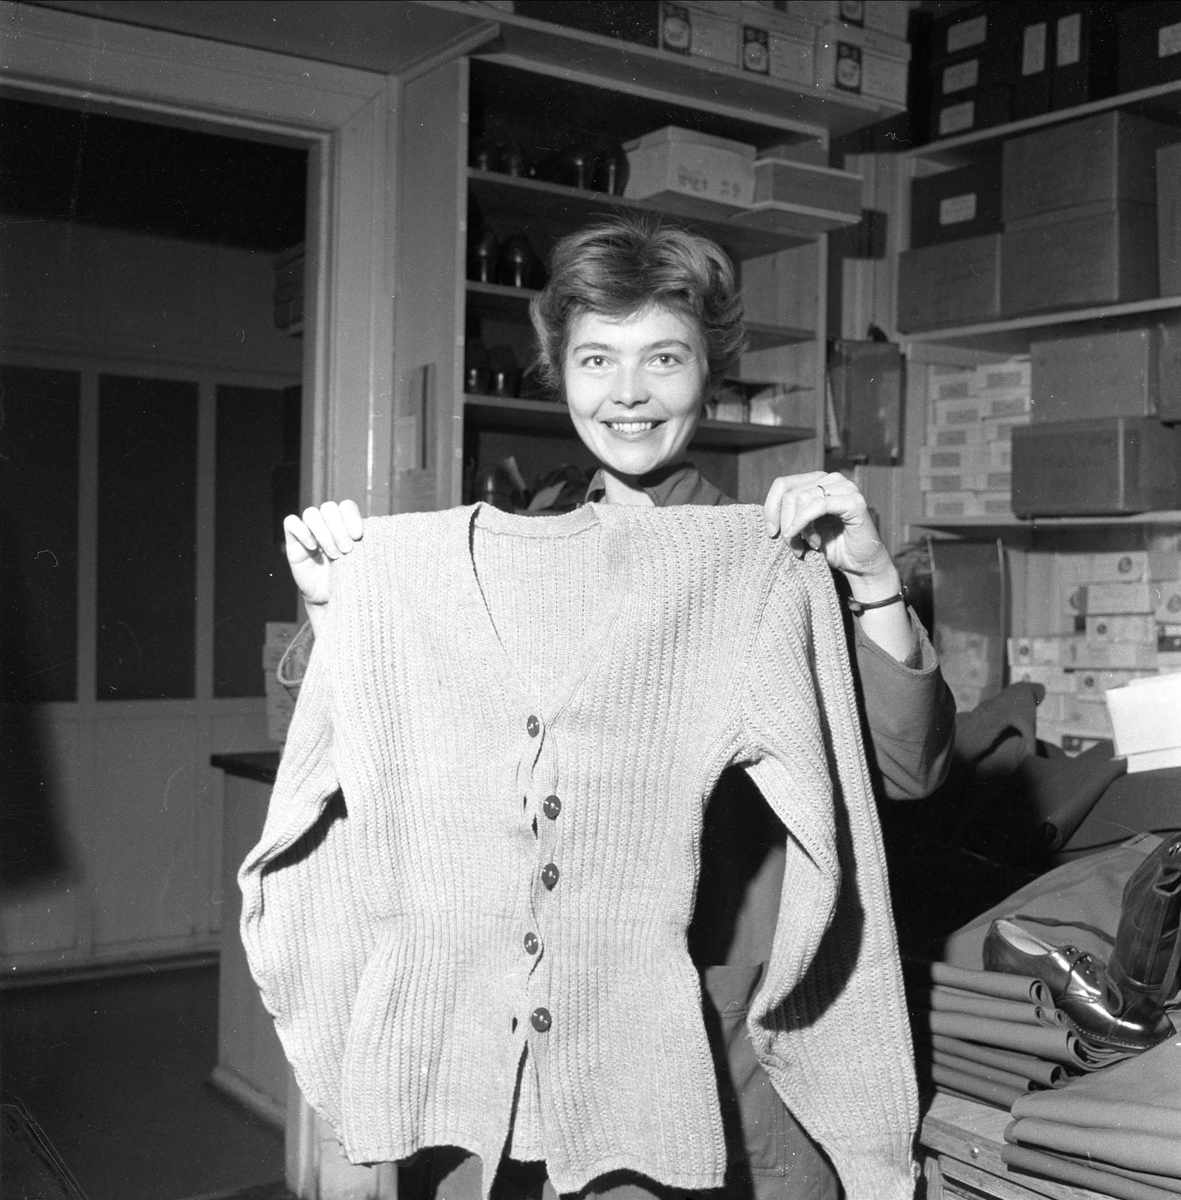 Kvinne holder jakke, Prinds Christian Augusts Minde, Storgata 36, Oslo,  09.10.1959.